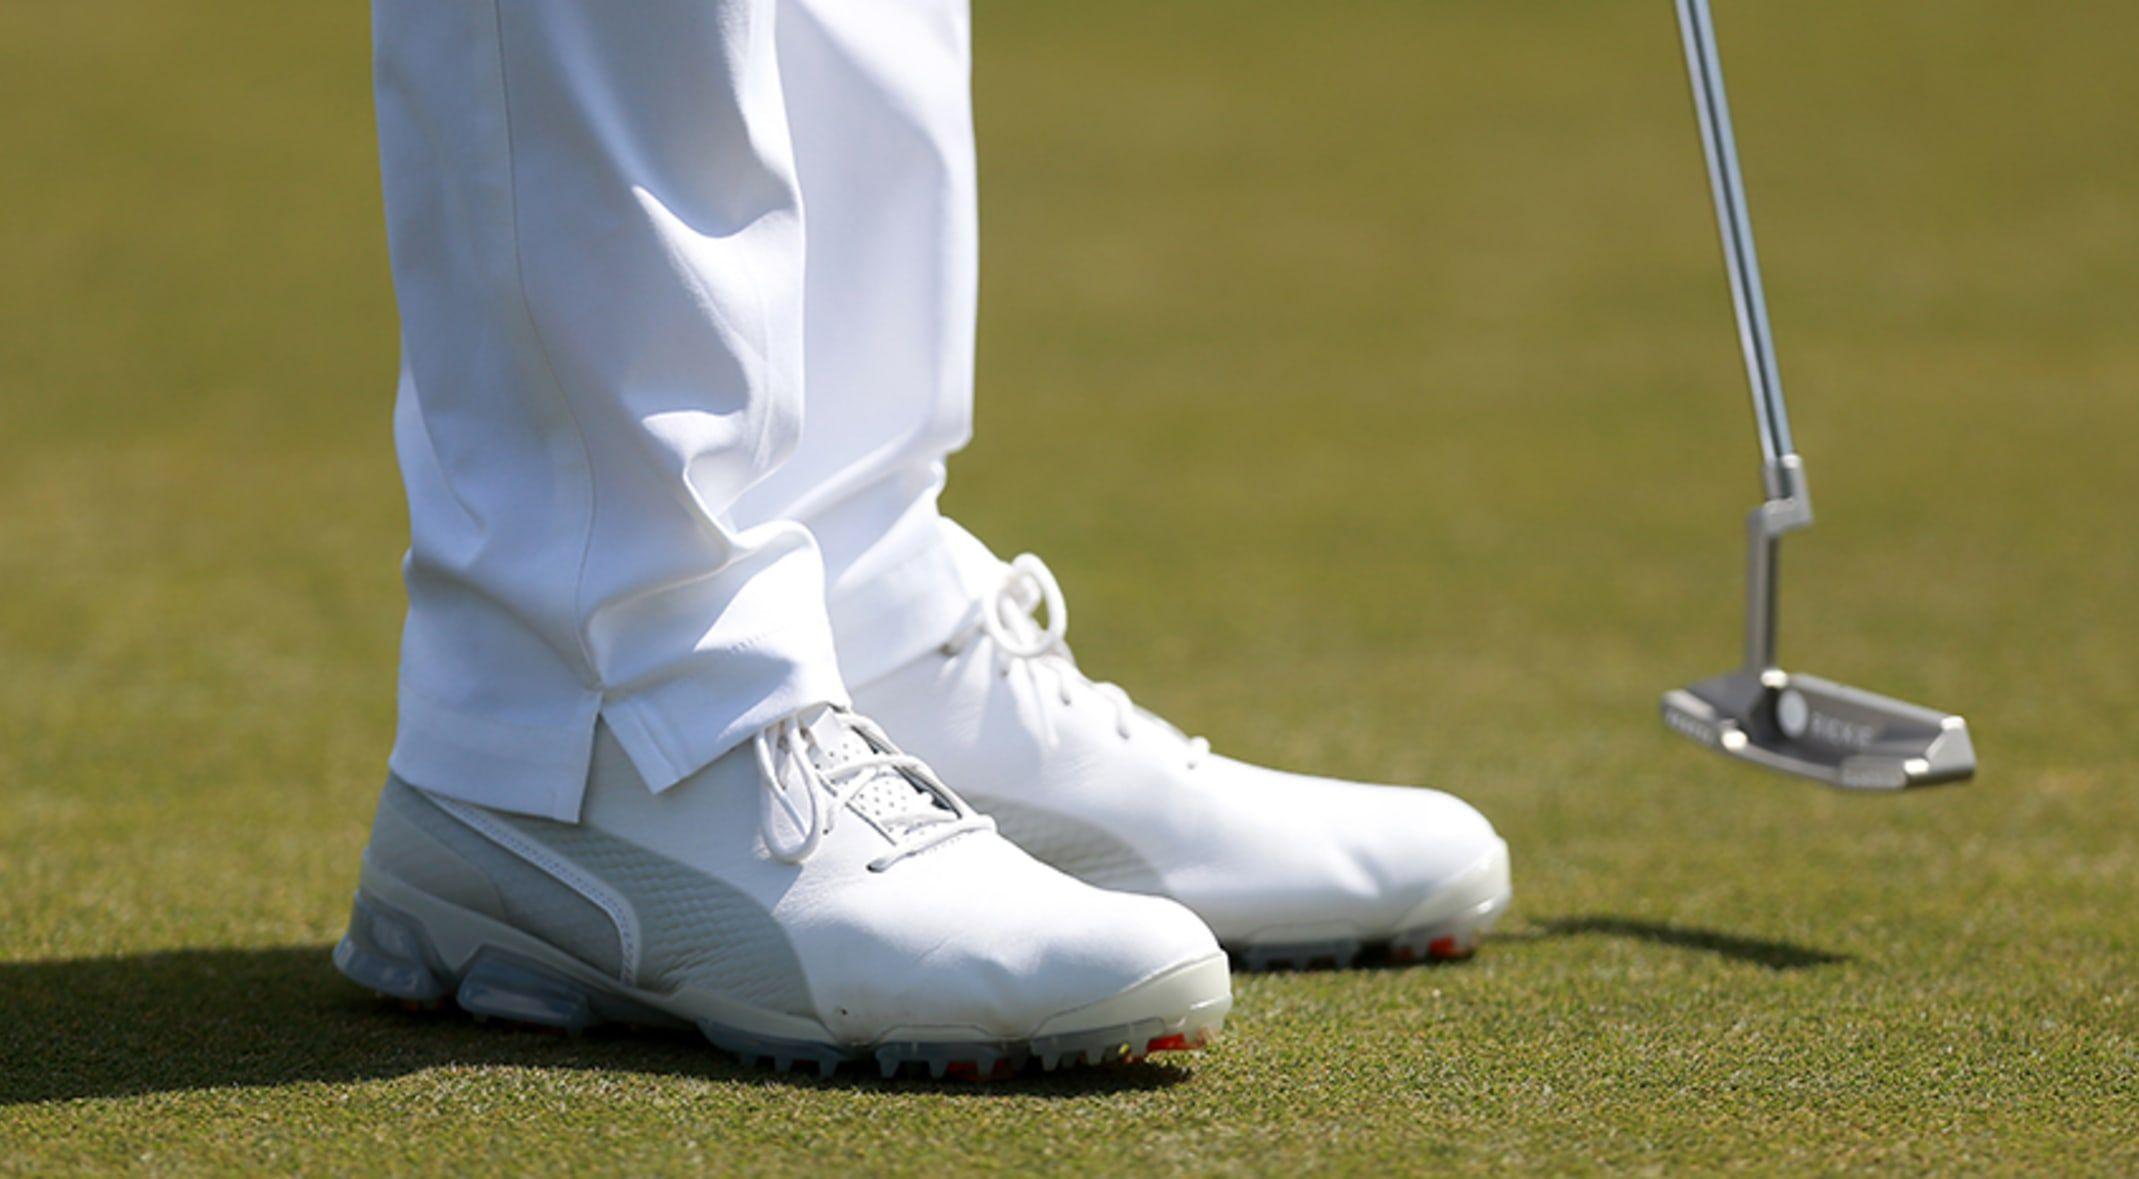 1. FootJoy Men's DryJoys Tour Golf Shoes